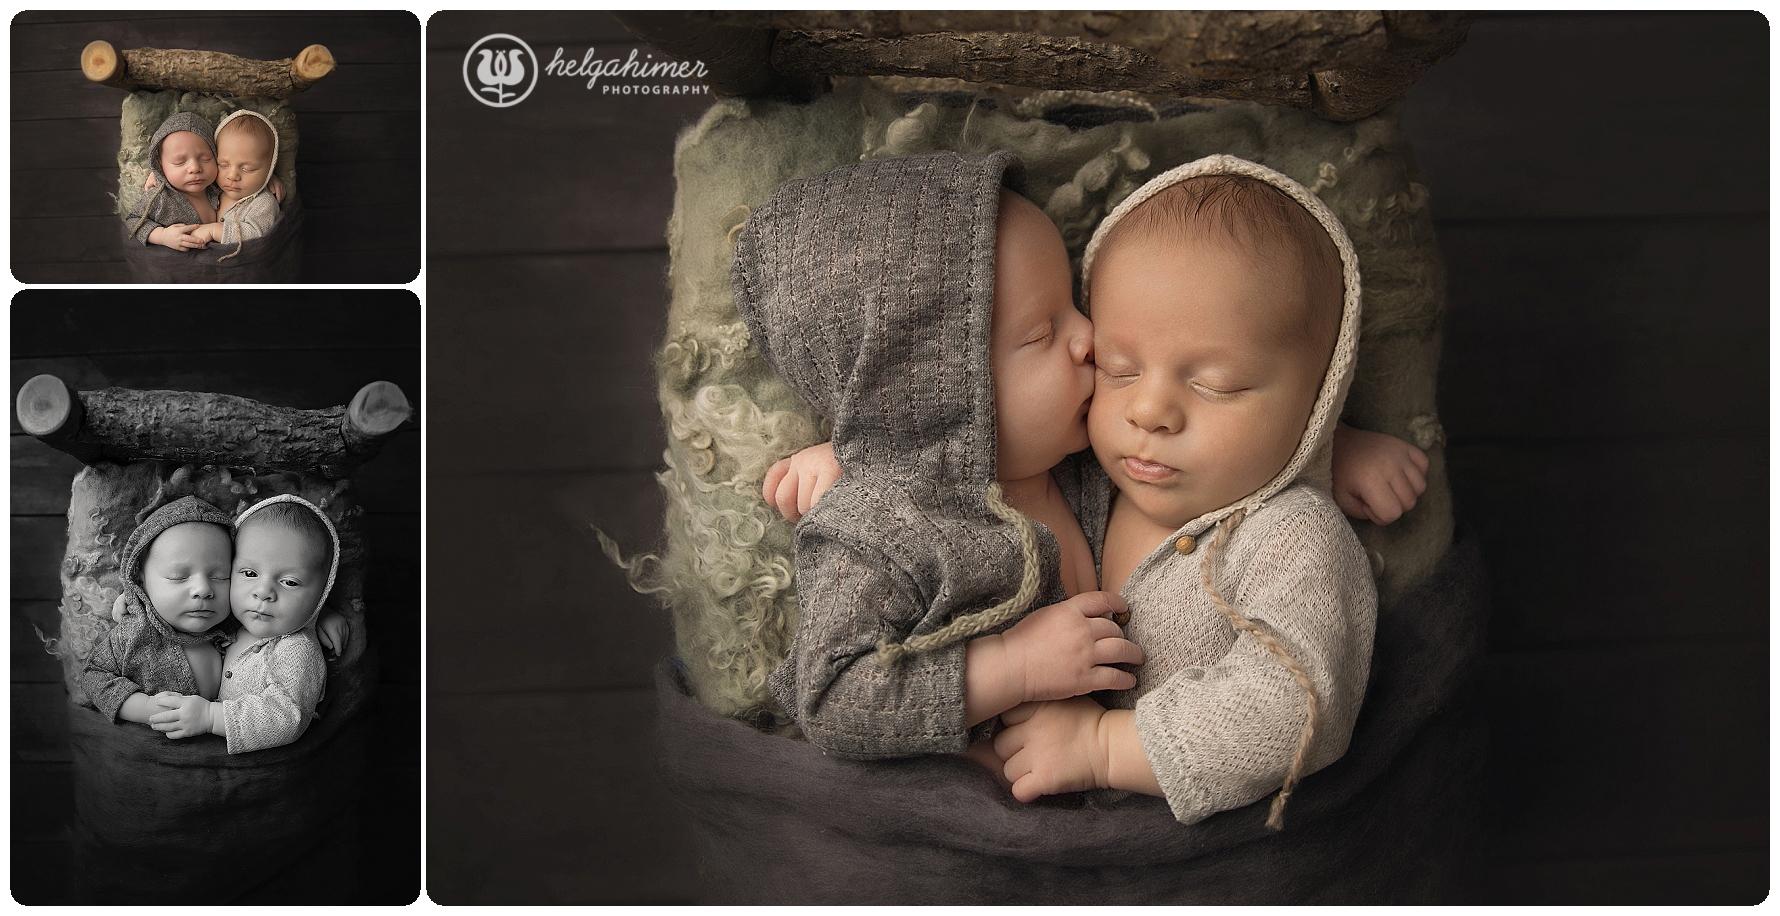 twins-newborn-photography-helgahimer-sudbury-nightynight-kissing-wooden-bed-miajoy